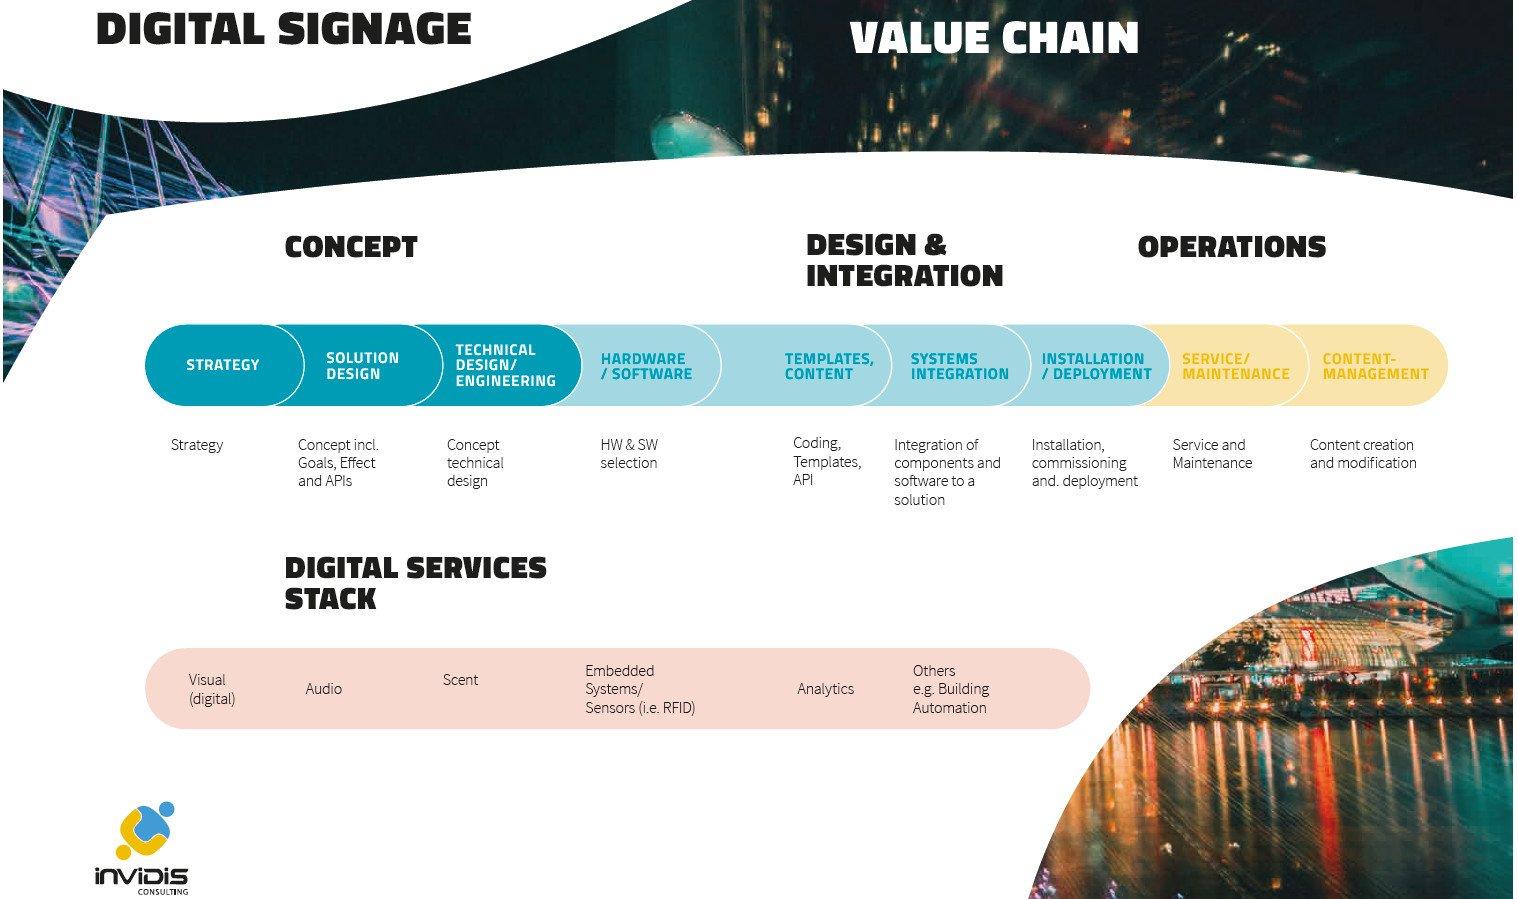 Digital signage value chain (Source: invidis yearbook 2018/19)